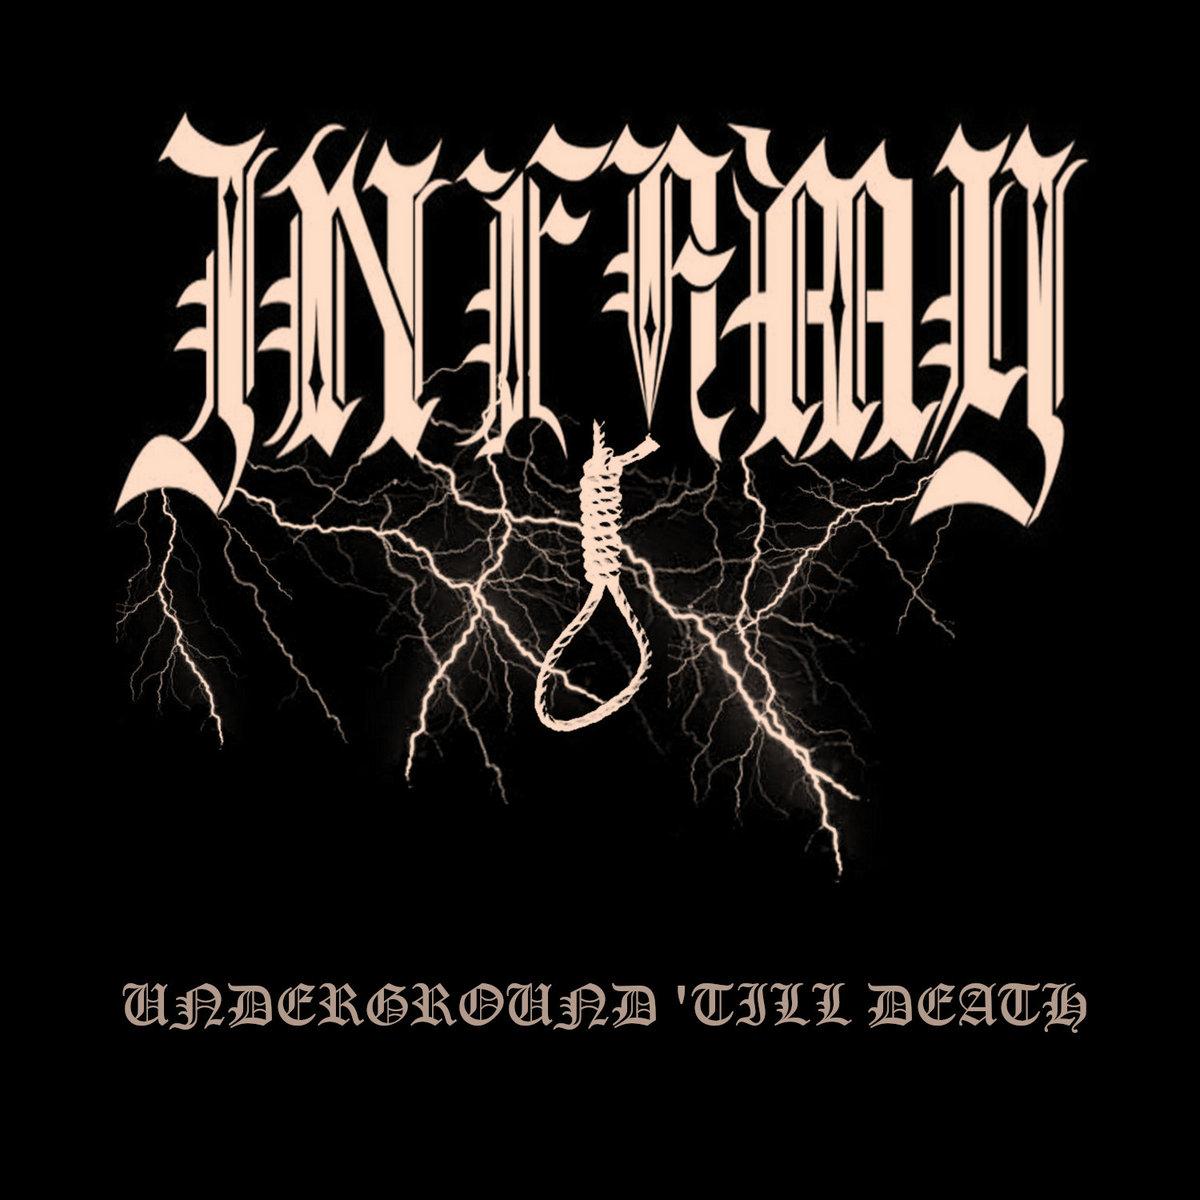 Infamy undergroud 'till death review le scribe du rock